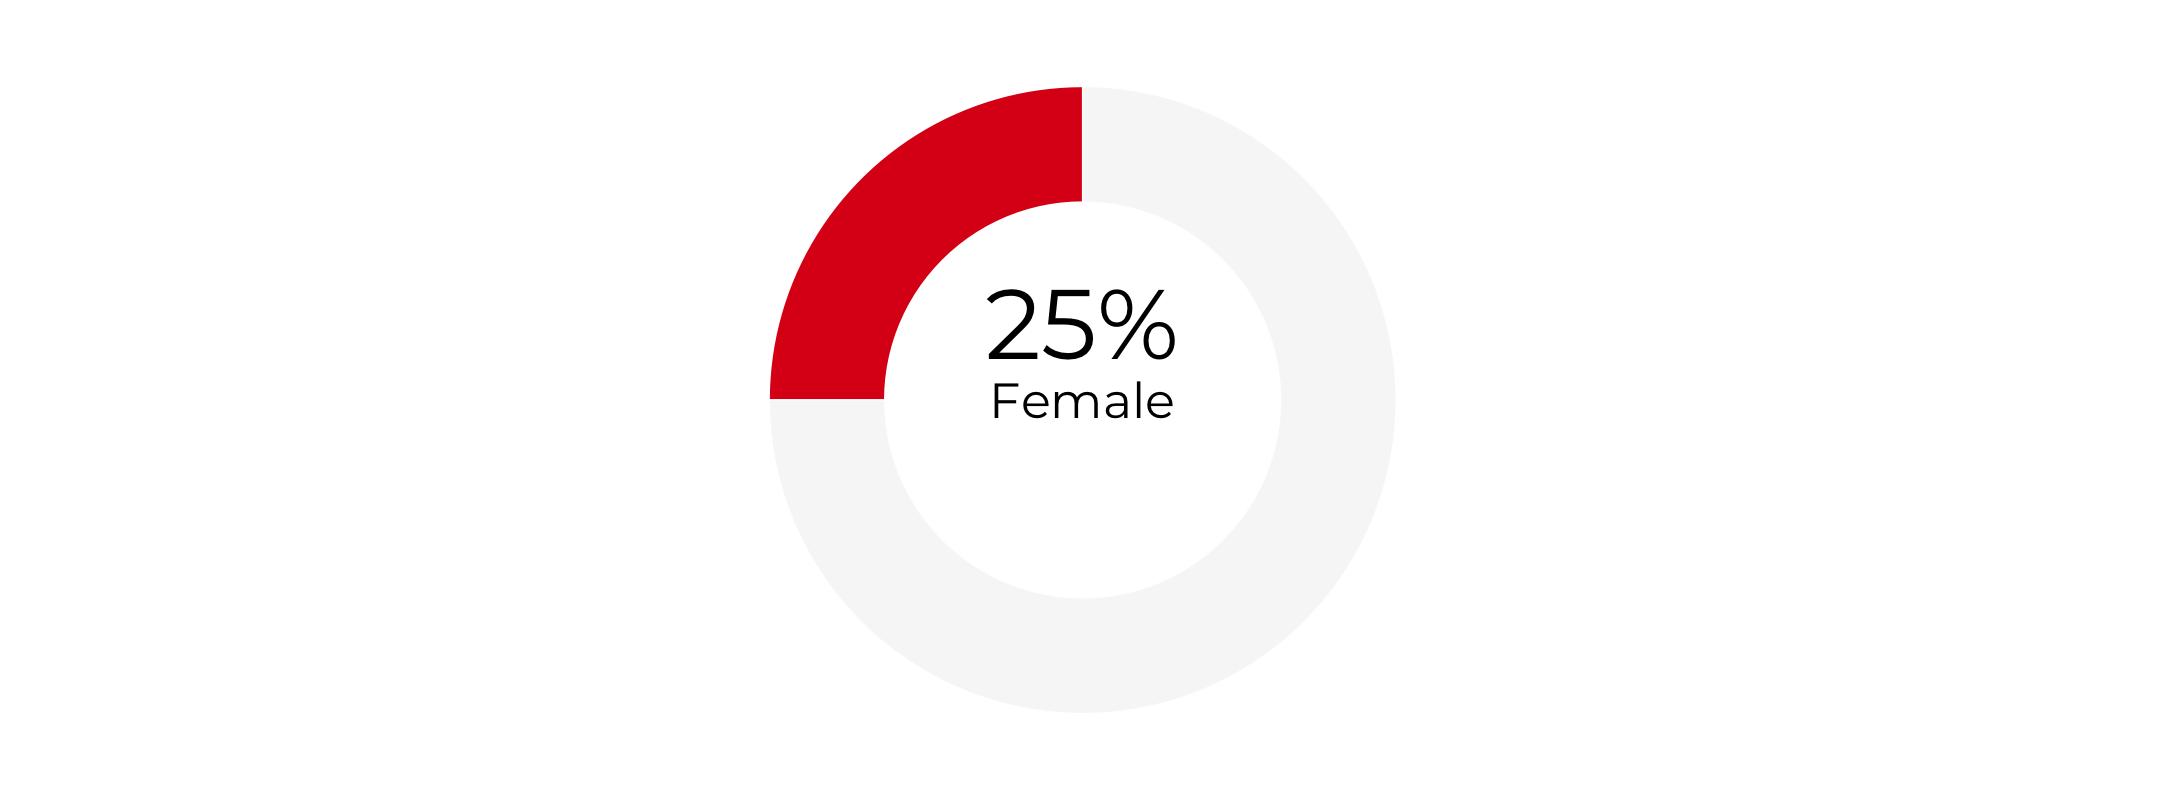 Graph about Gender Composition of Deputy Secretaries of Transportation. More detailed text description below.